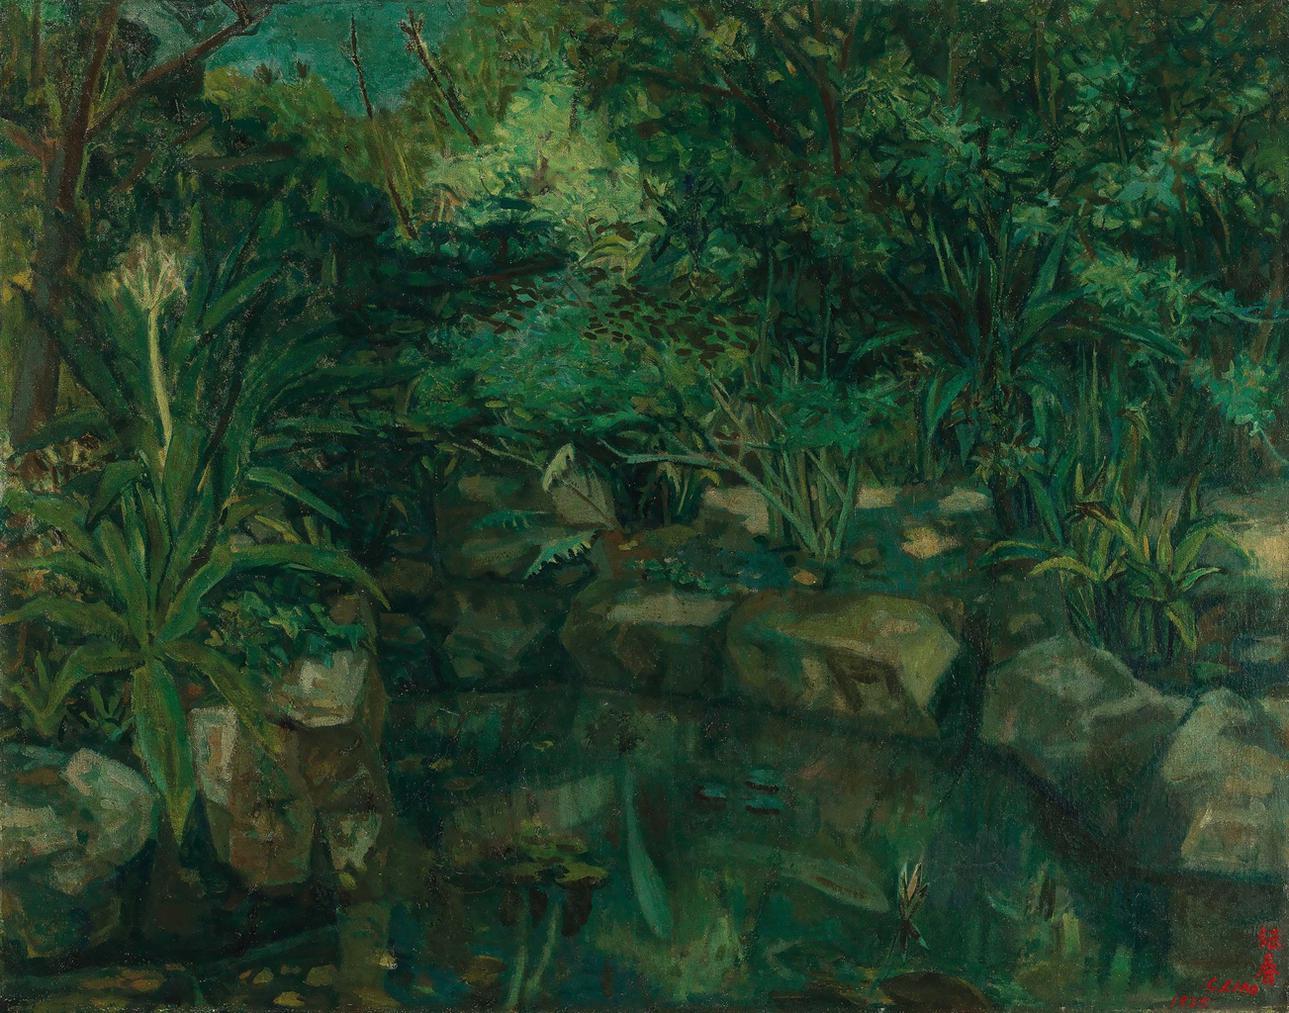 Liao Chi-chun-Tainan Park-1935